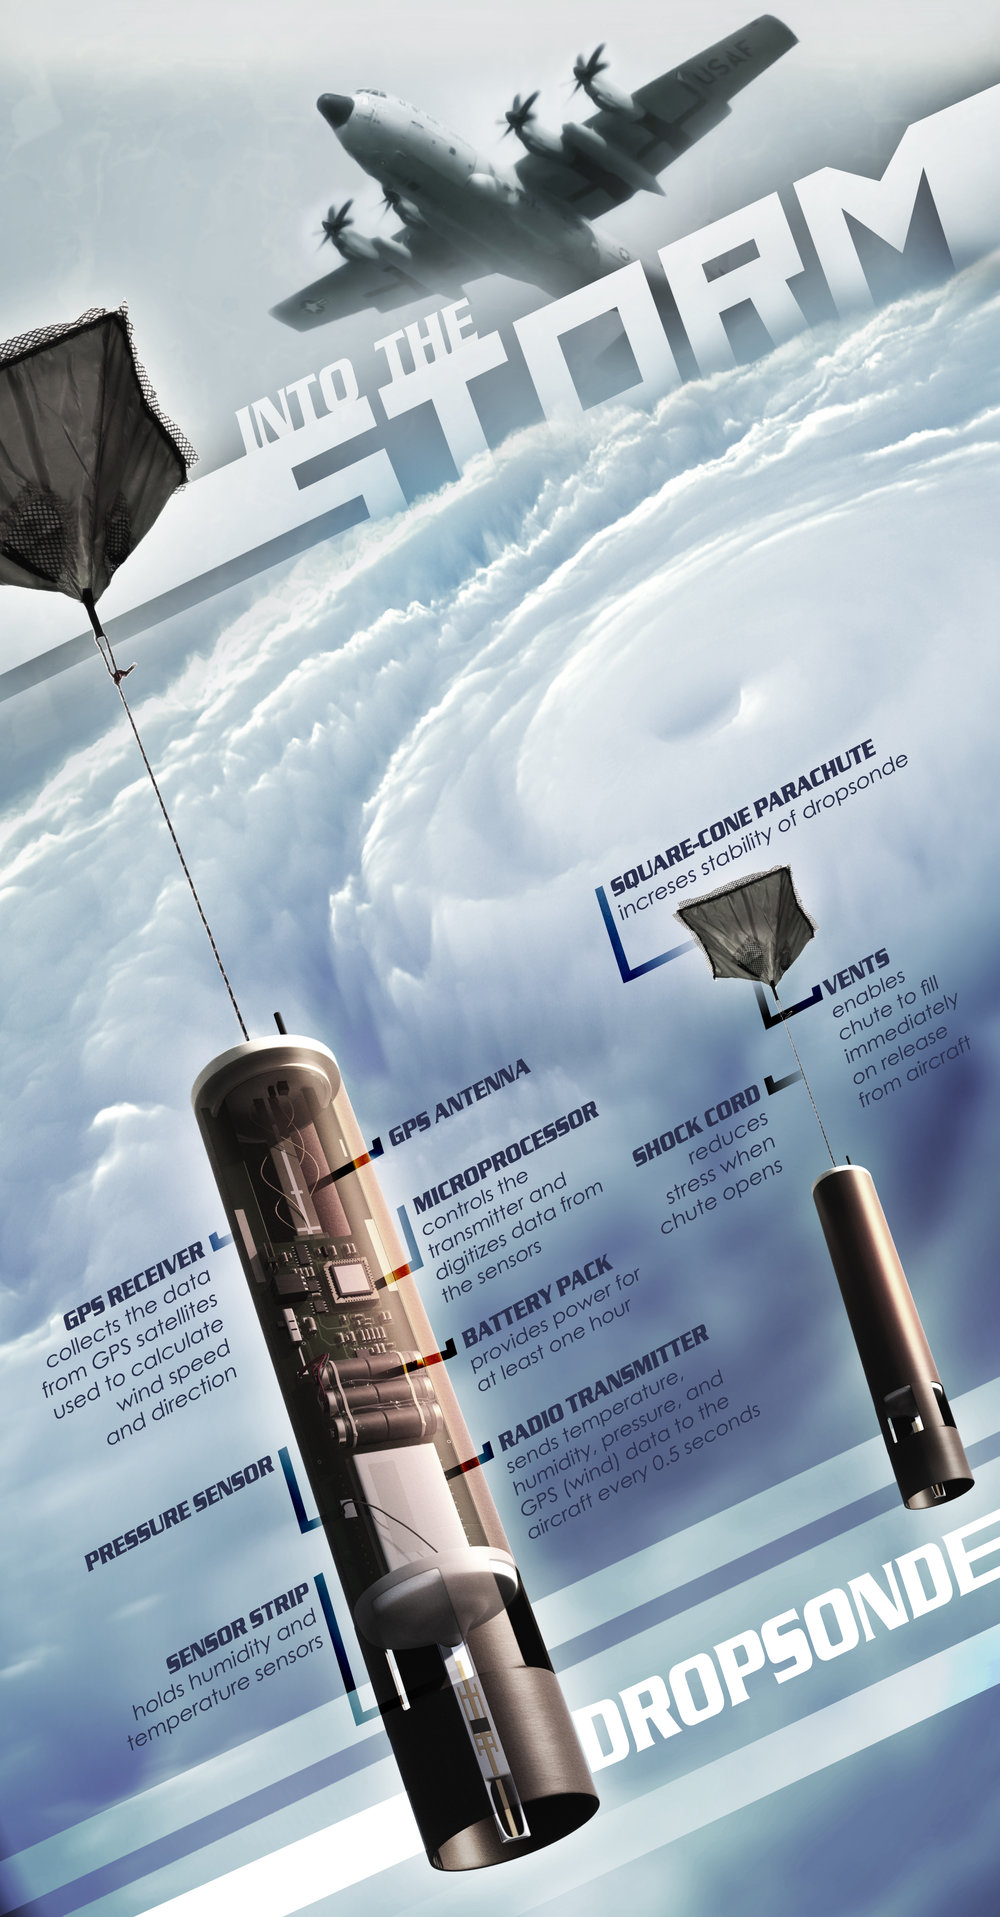 HurricaneHunters_Dropsonde_Airman.jpg